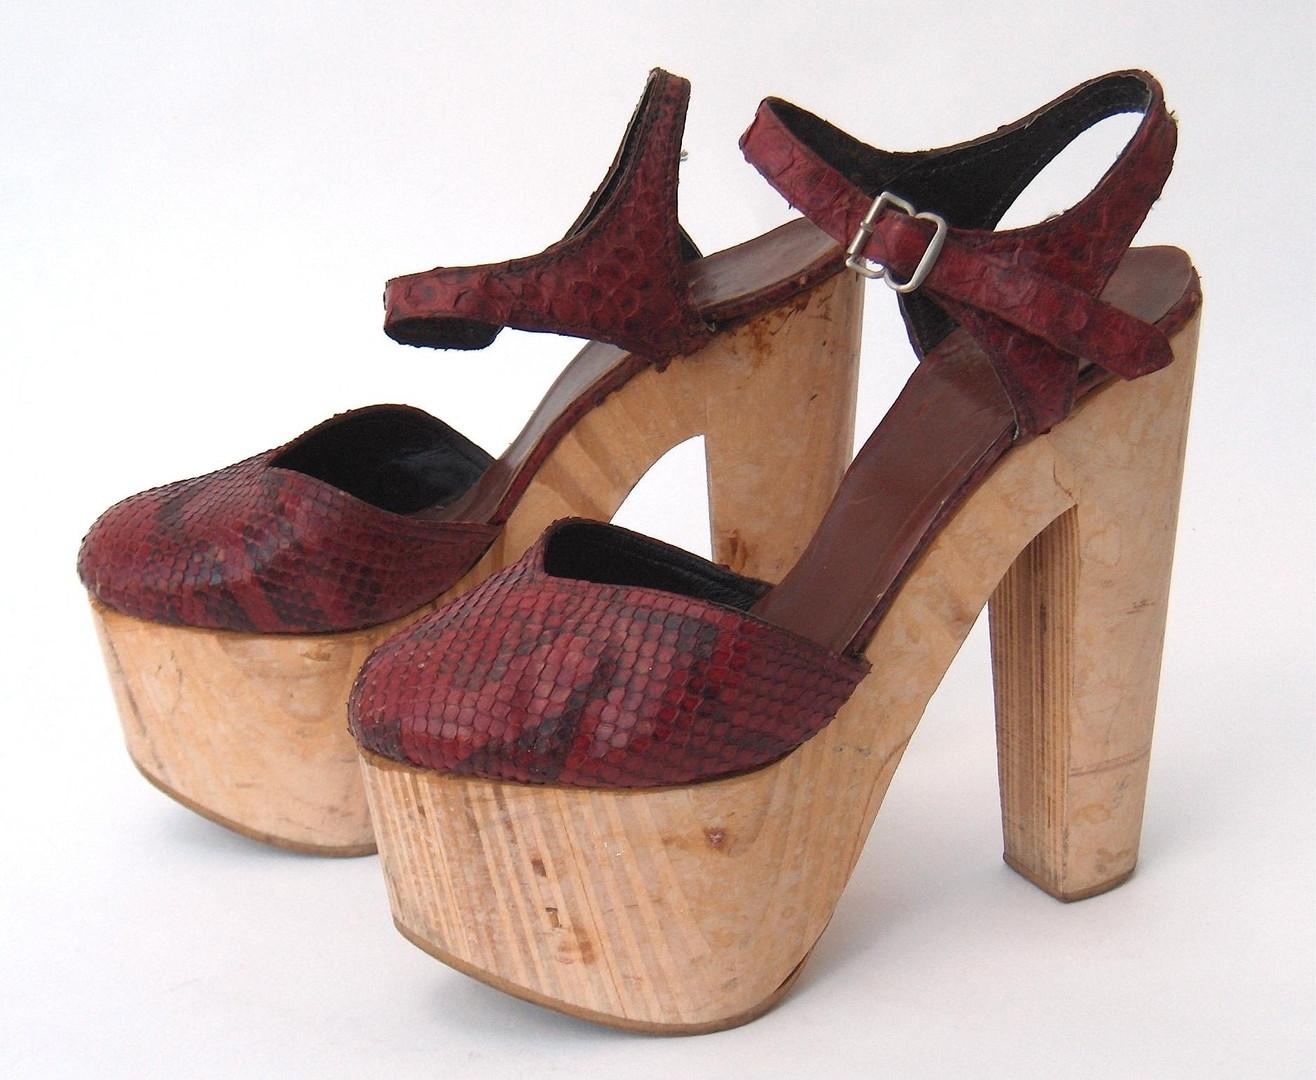 Dyed Python Snakeskin Shoes, c. 1975